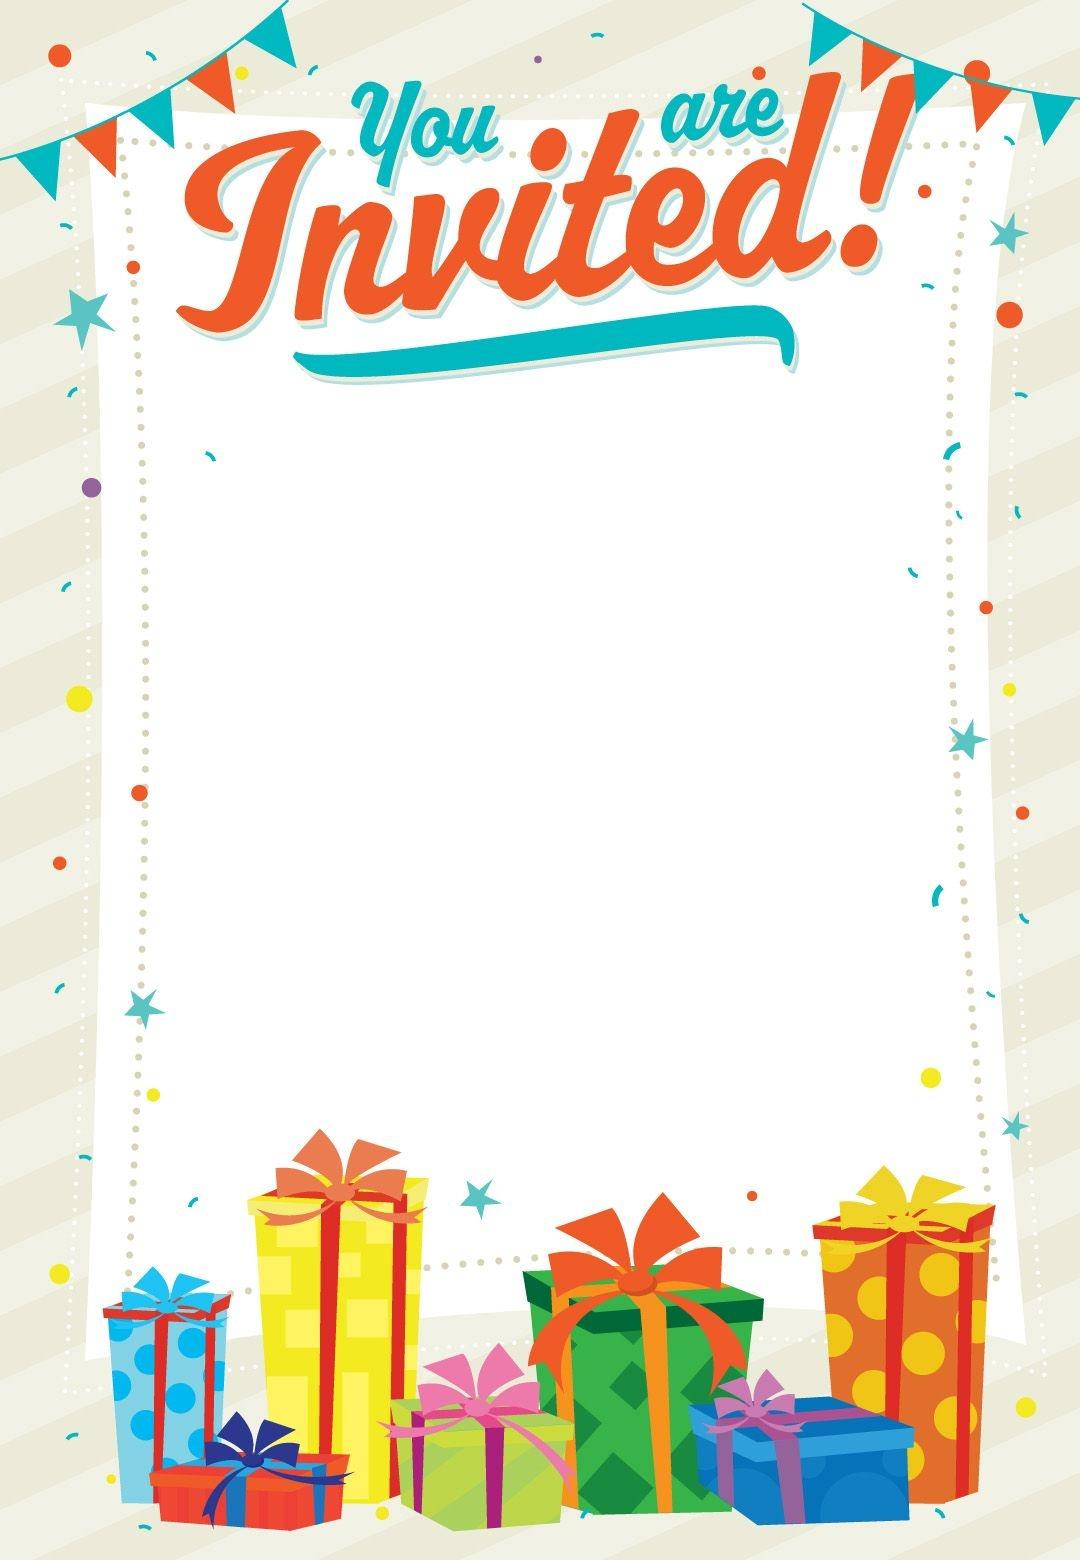 Free Printable You Are Invited Invitation   Printables & Fonts - Free Printable Birthday Invitation Cards Templates